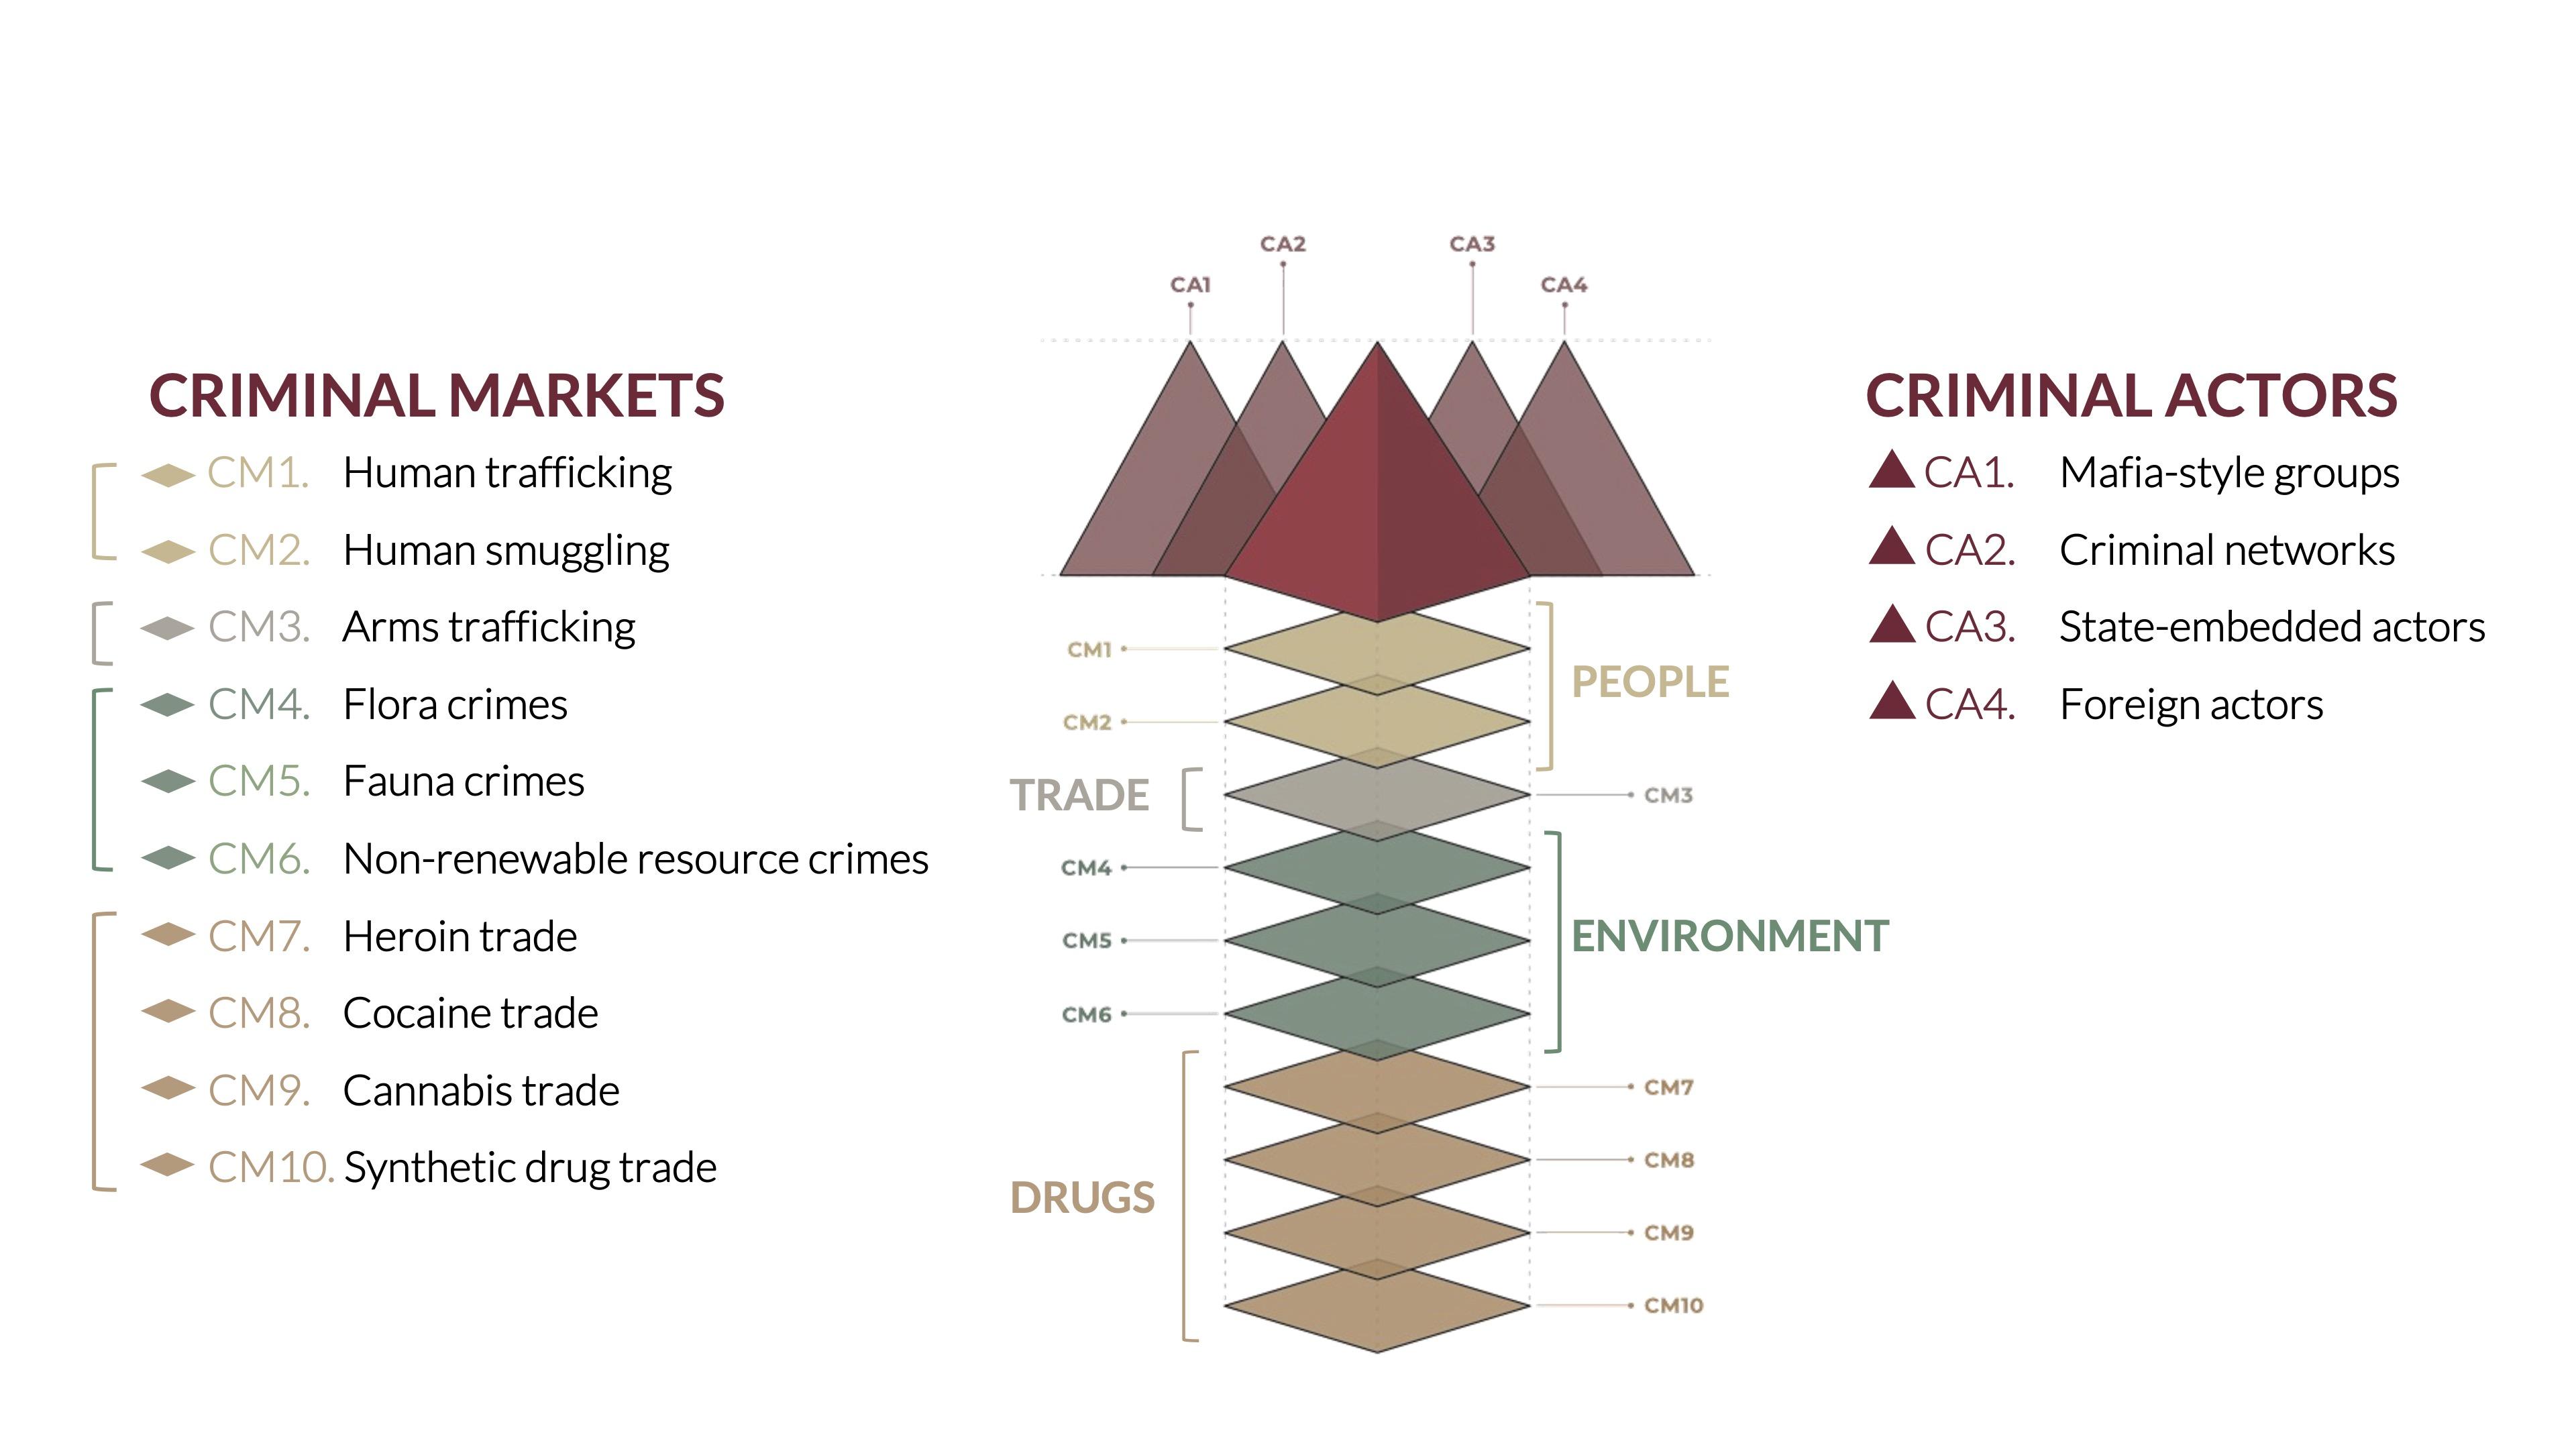 Criminality components